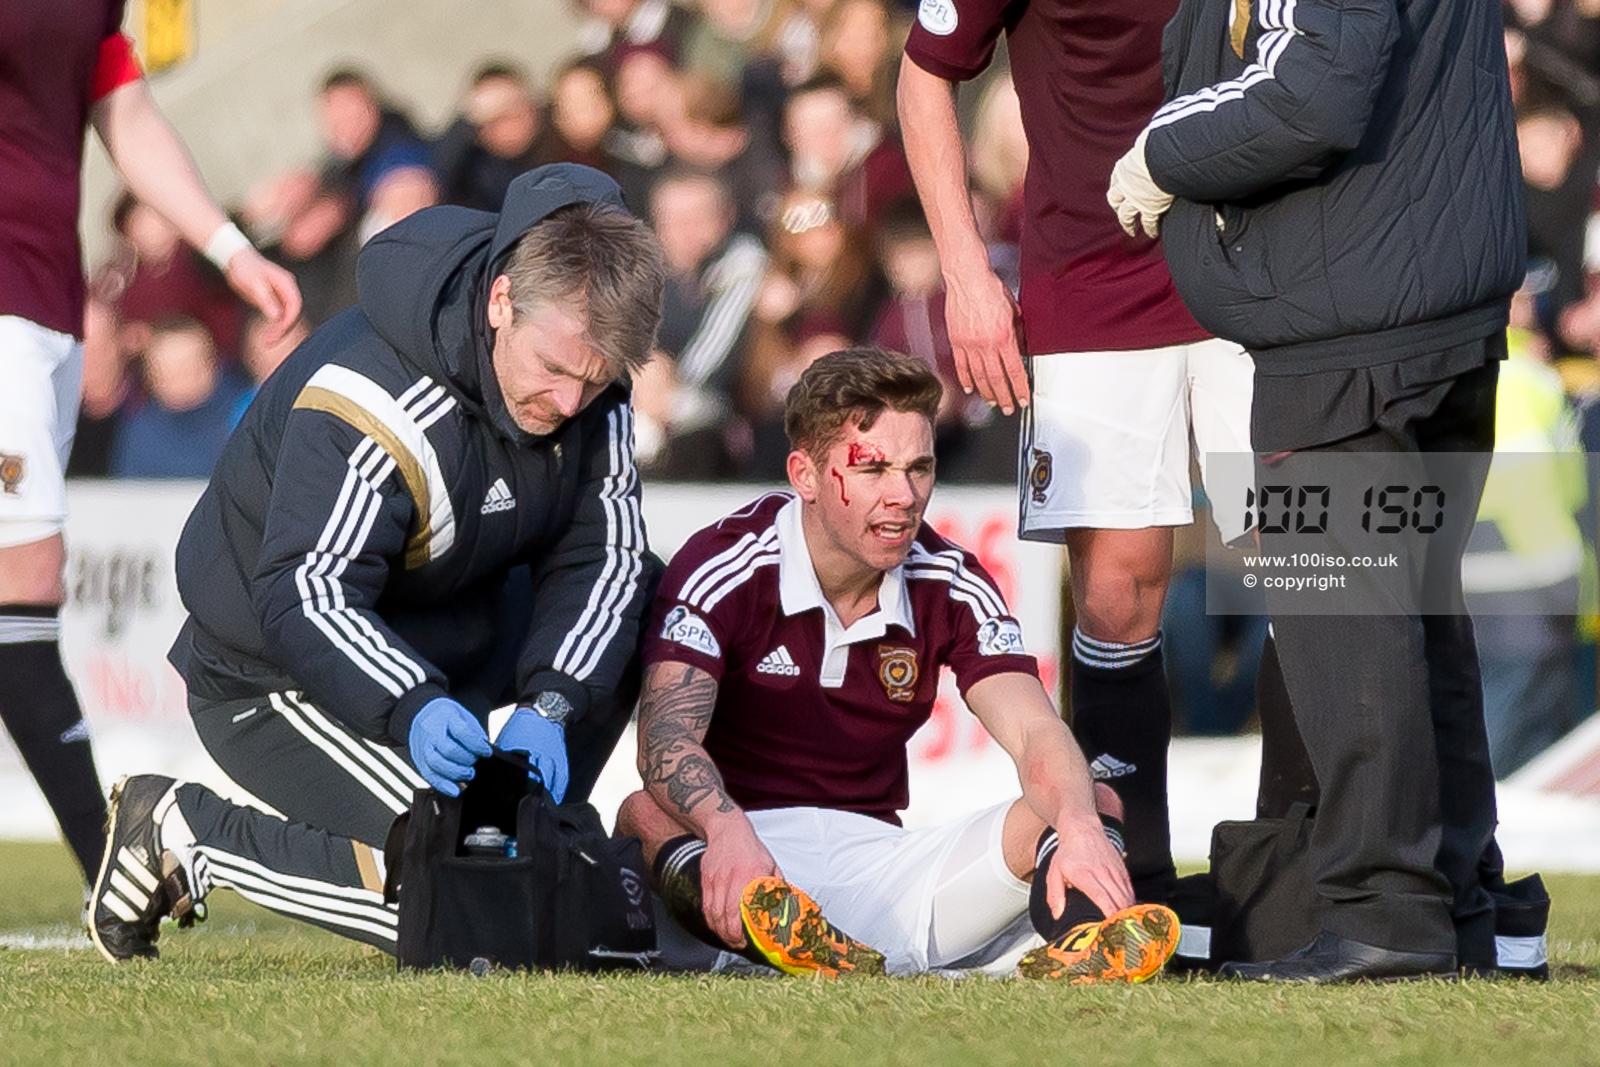 Sam Nicholson injury – 7th February 2015